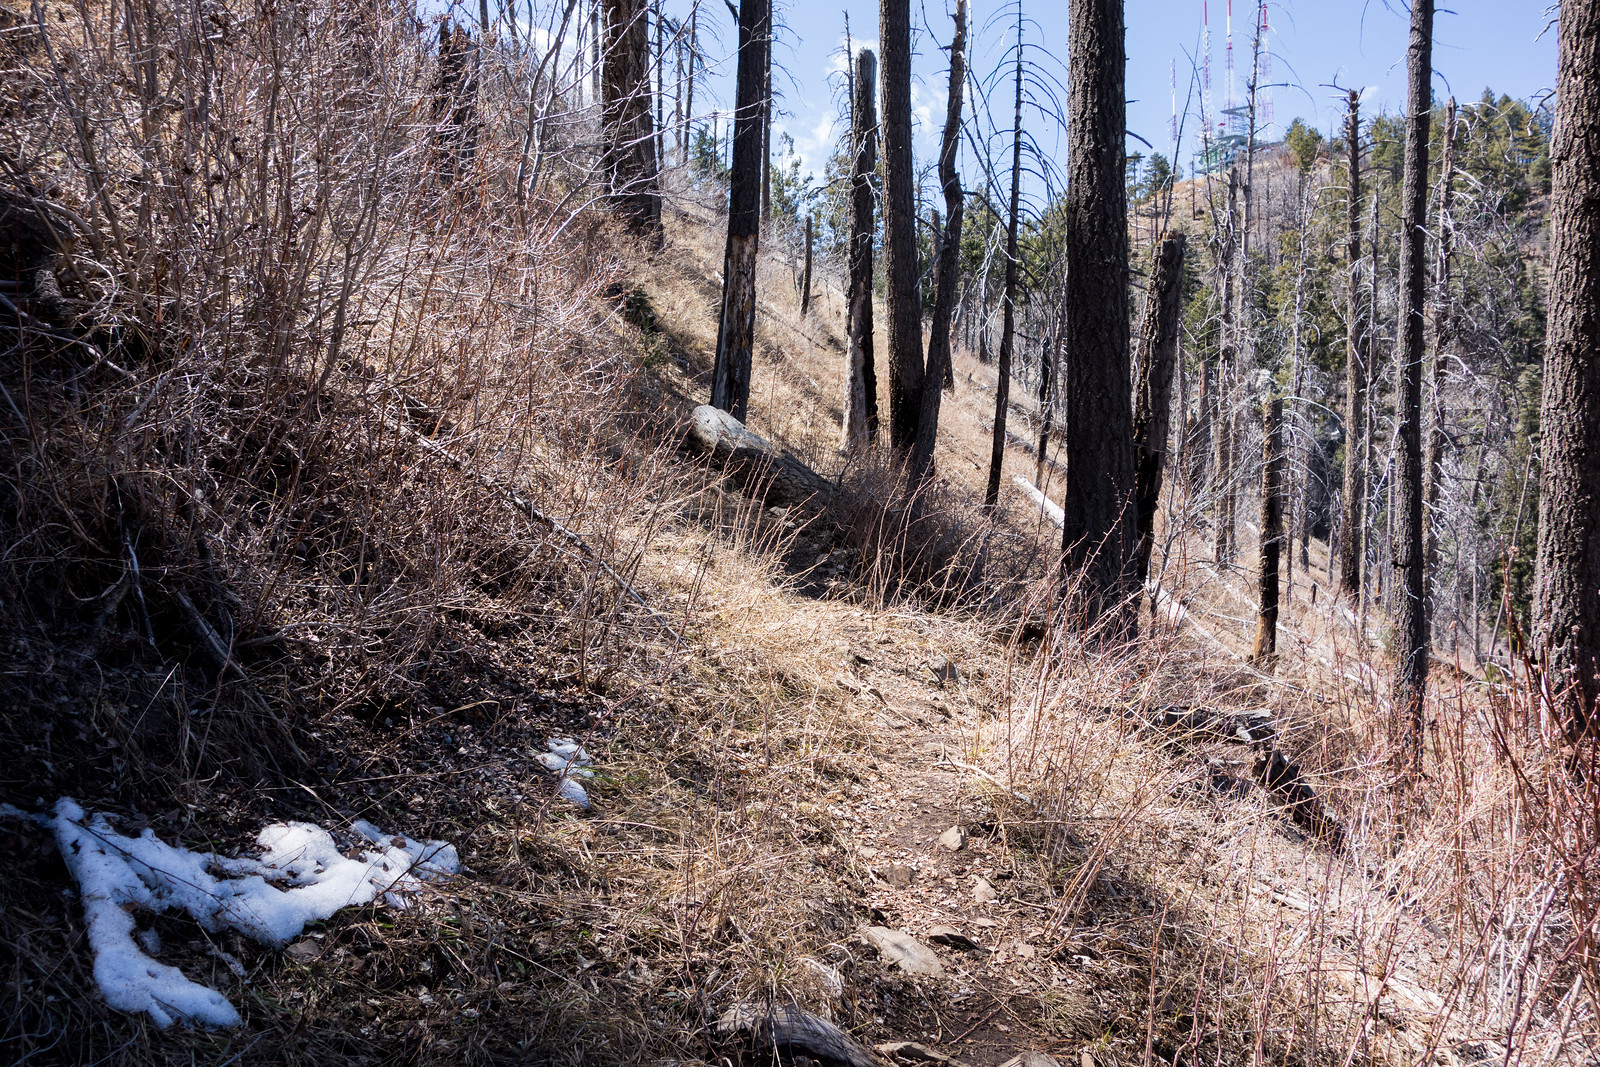 1404 A last Bit of Snow near the Butterfly Trail